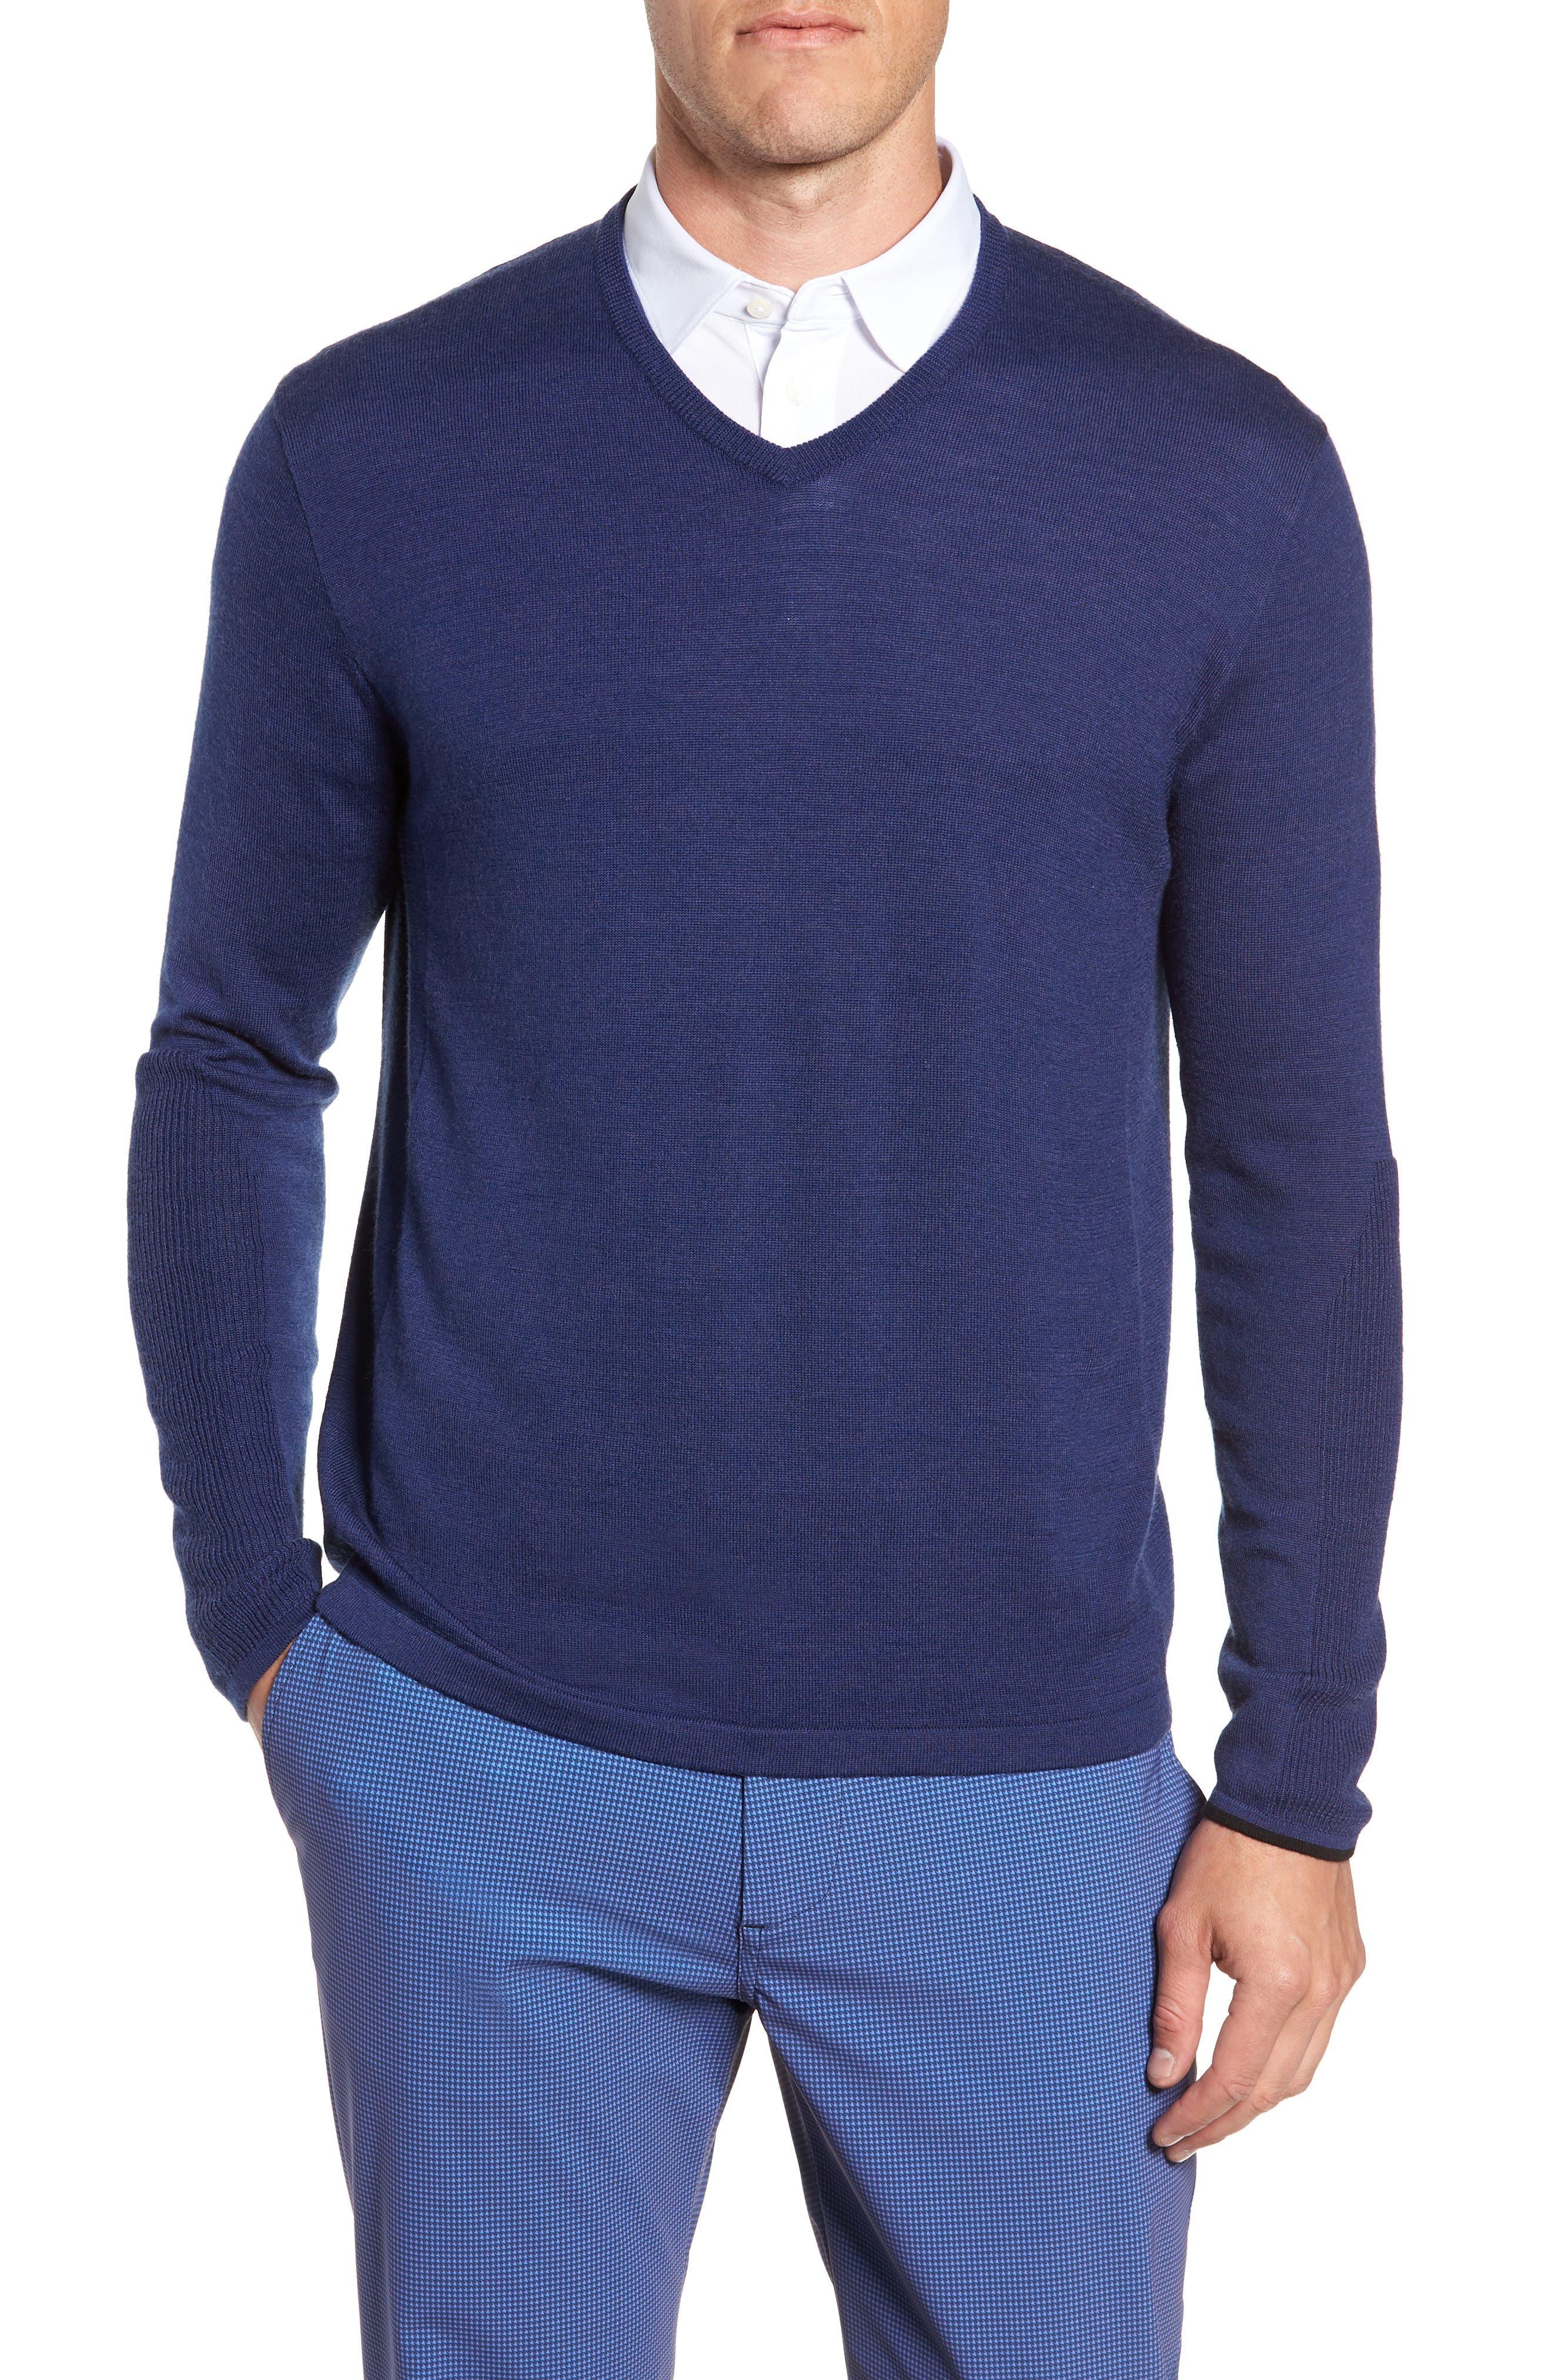 GREYSON Guide Merino Wool Blend V-Neck Sweater in Indigo